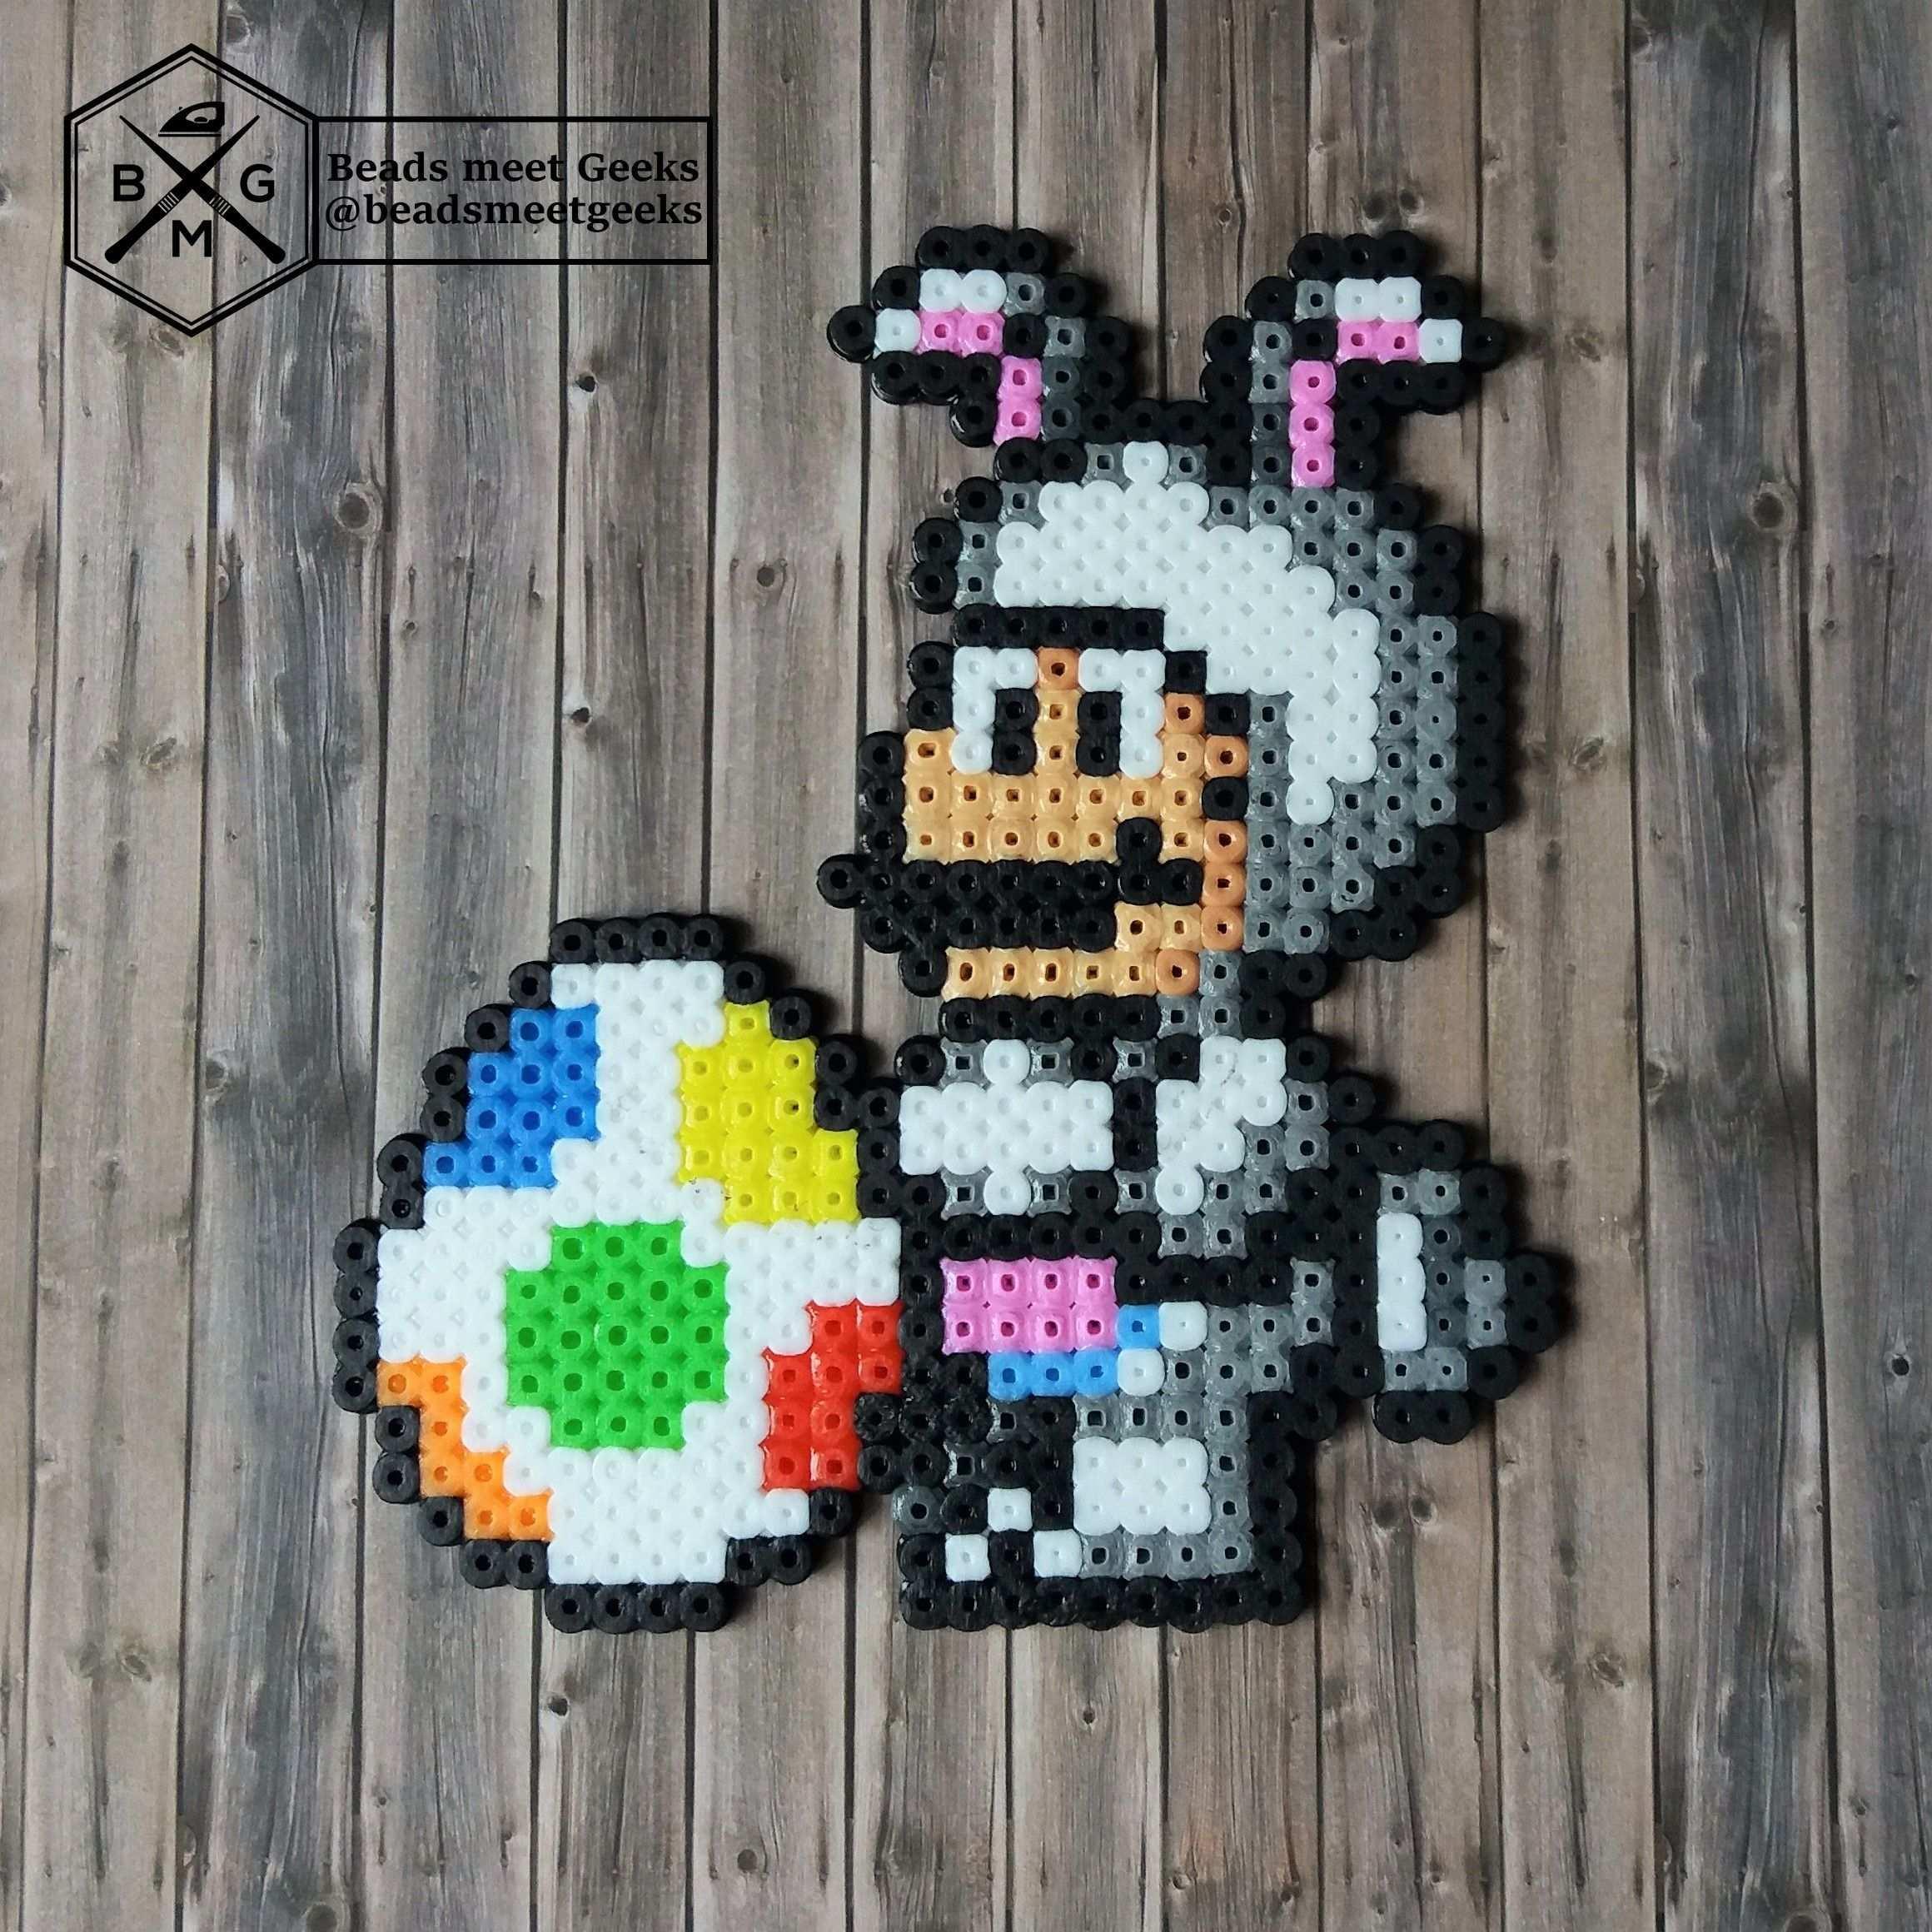 Easter Super Mario With Yoshi Egg Hama Artkal Perler Beads Beadsmeetgeeks Bugelperlen Vorlagen Bugelperlen Muster Perlenmuster